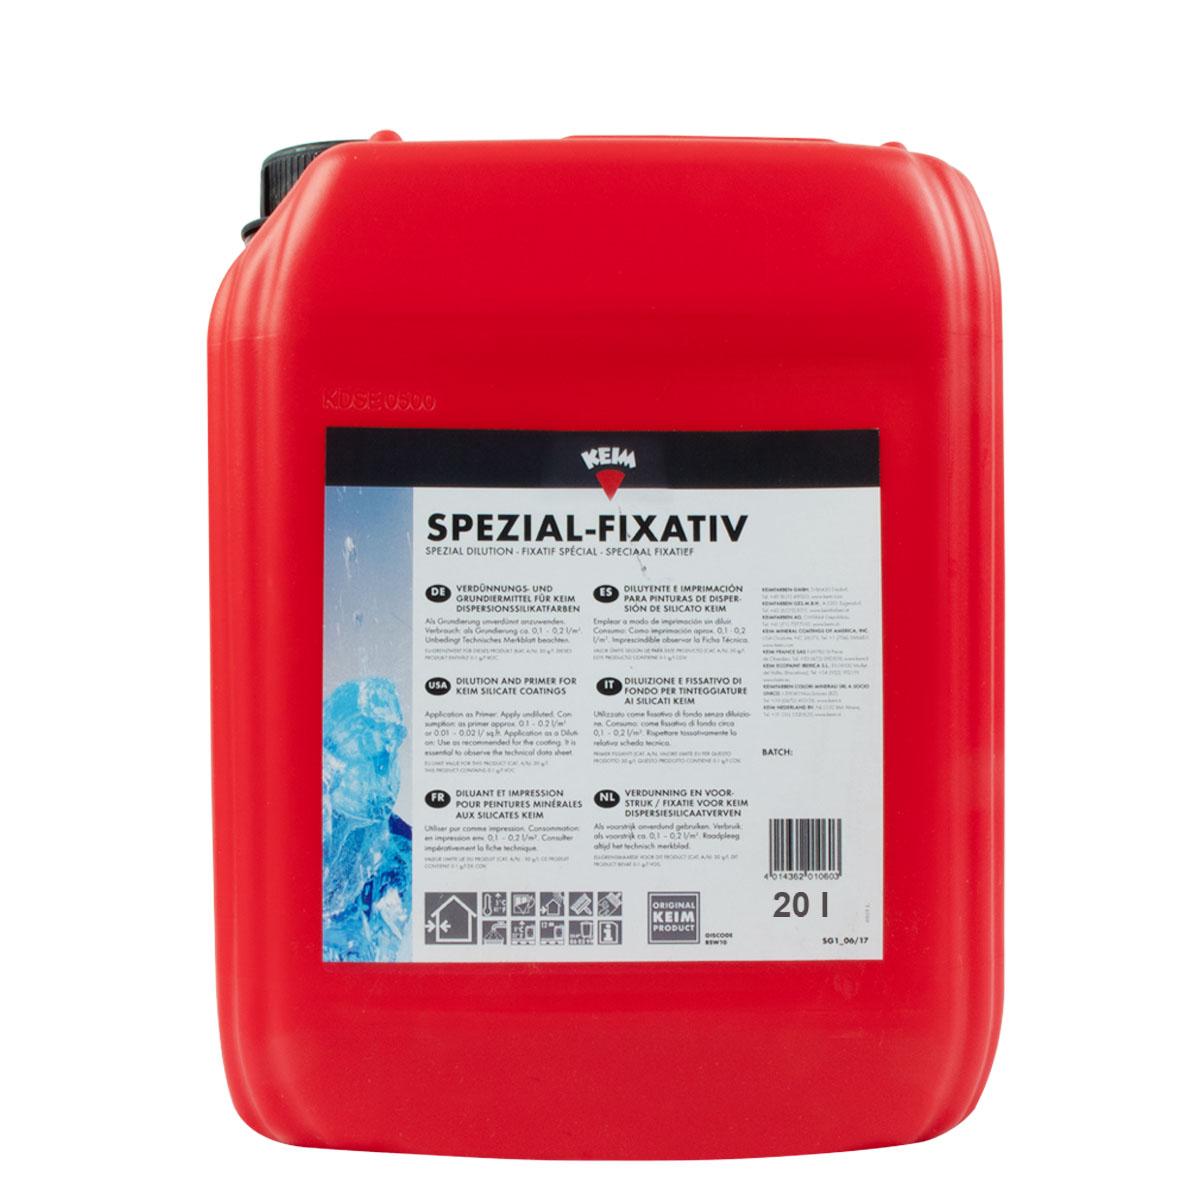 Keim Spezial-Fixativ 20L, Verdünnungsmittel auf Silikatbasis